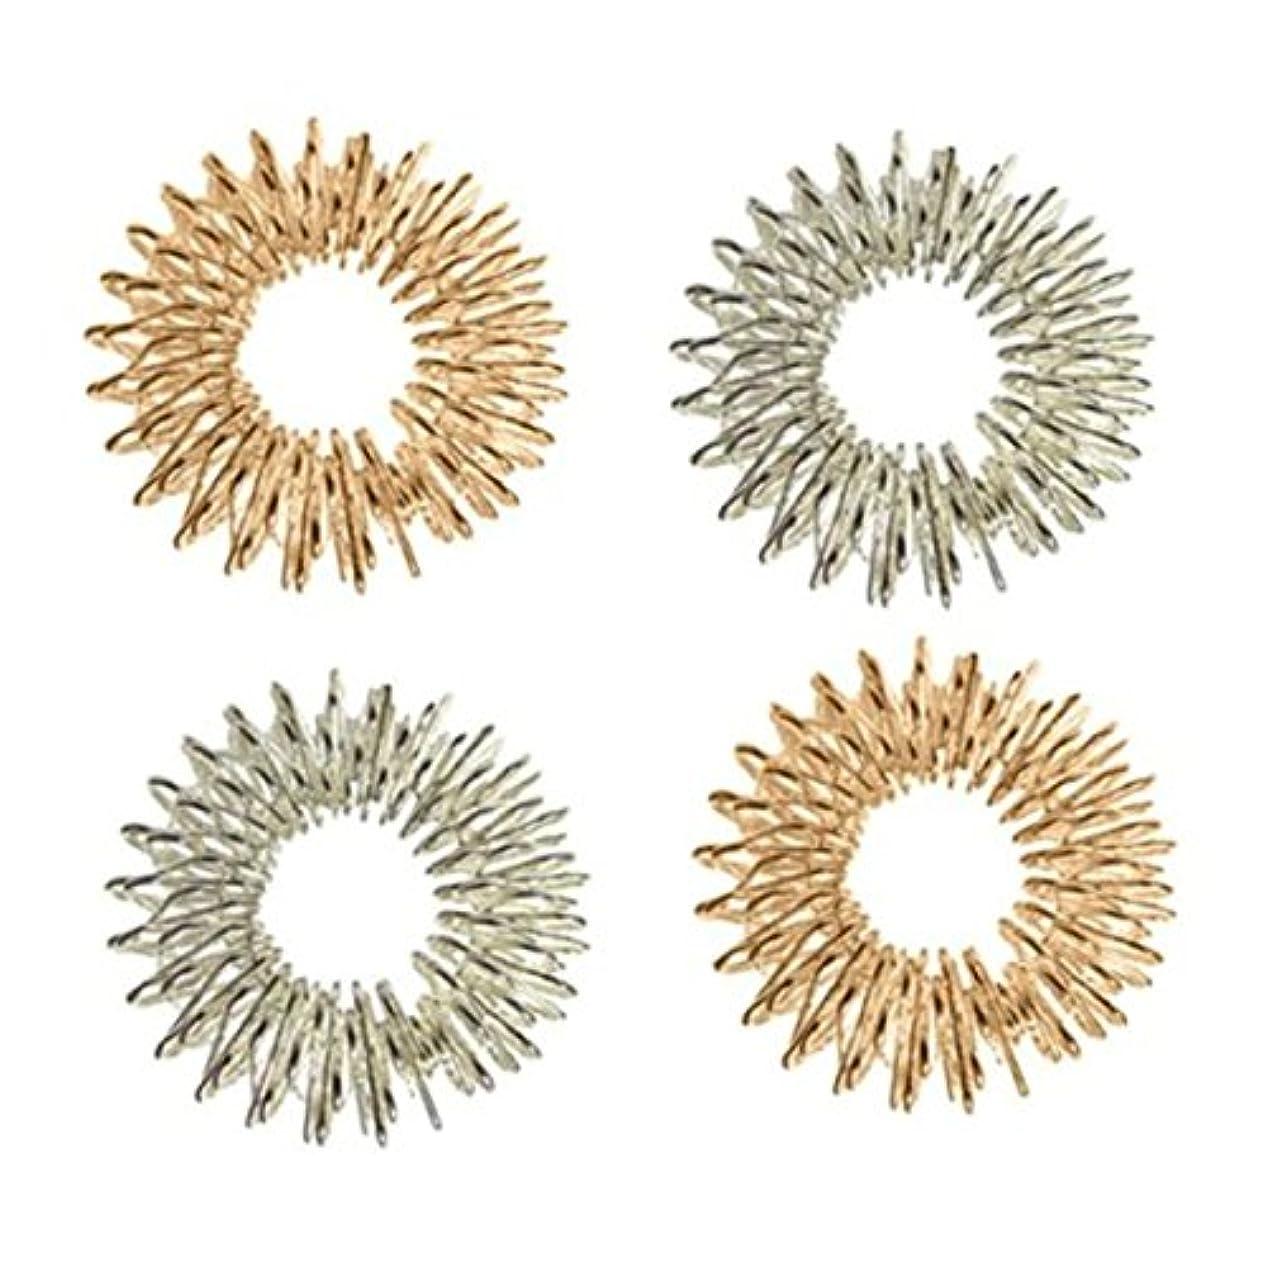 Healifty 4本指圧マッサージリング指の循環リング子供のための十代の若者たちの大人(シルバー+ゴールデン)